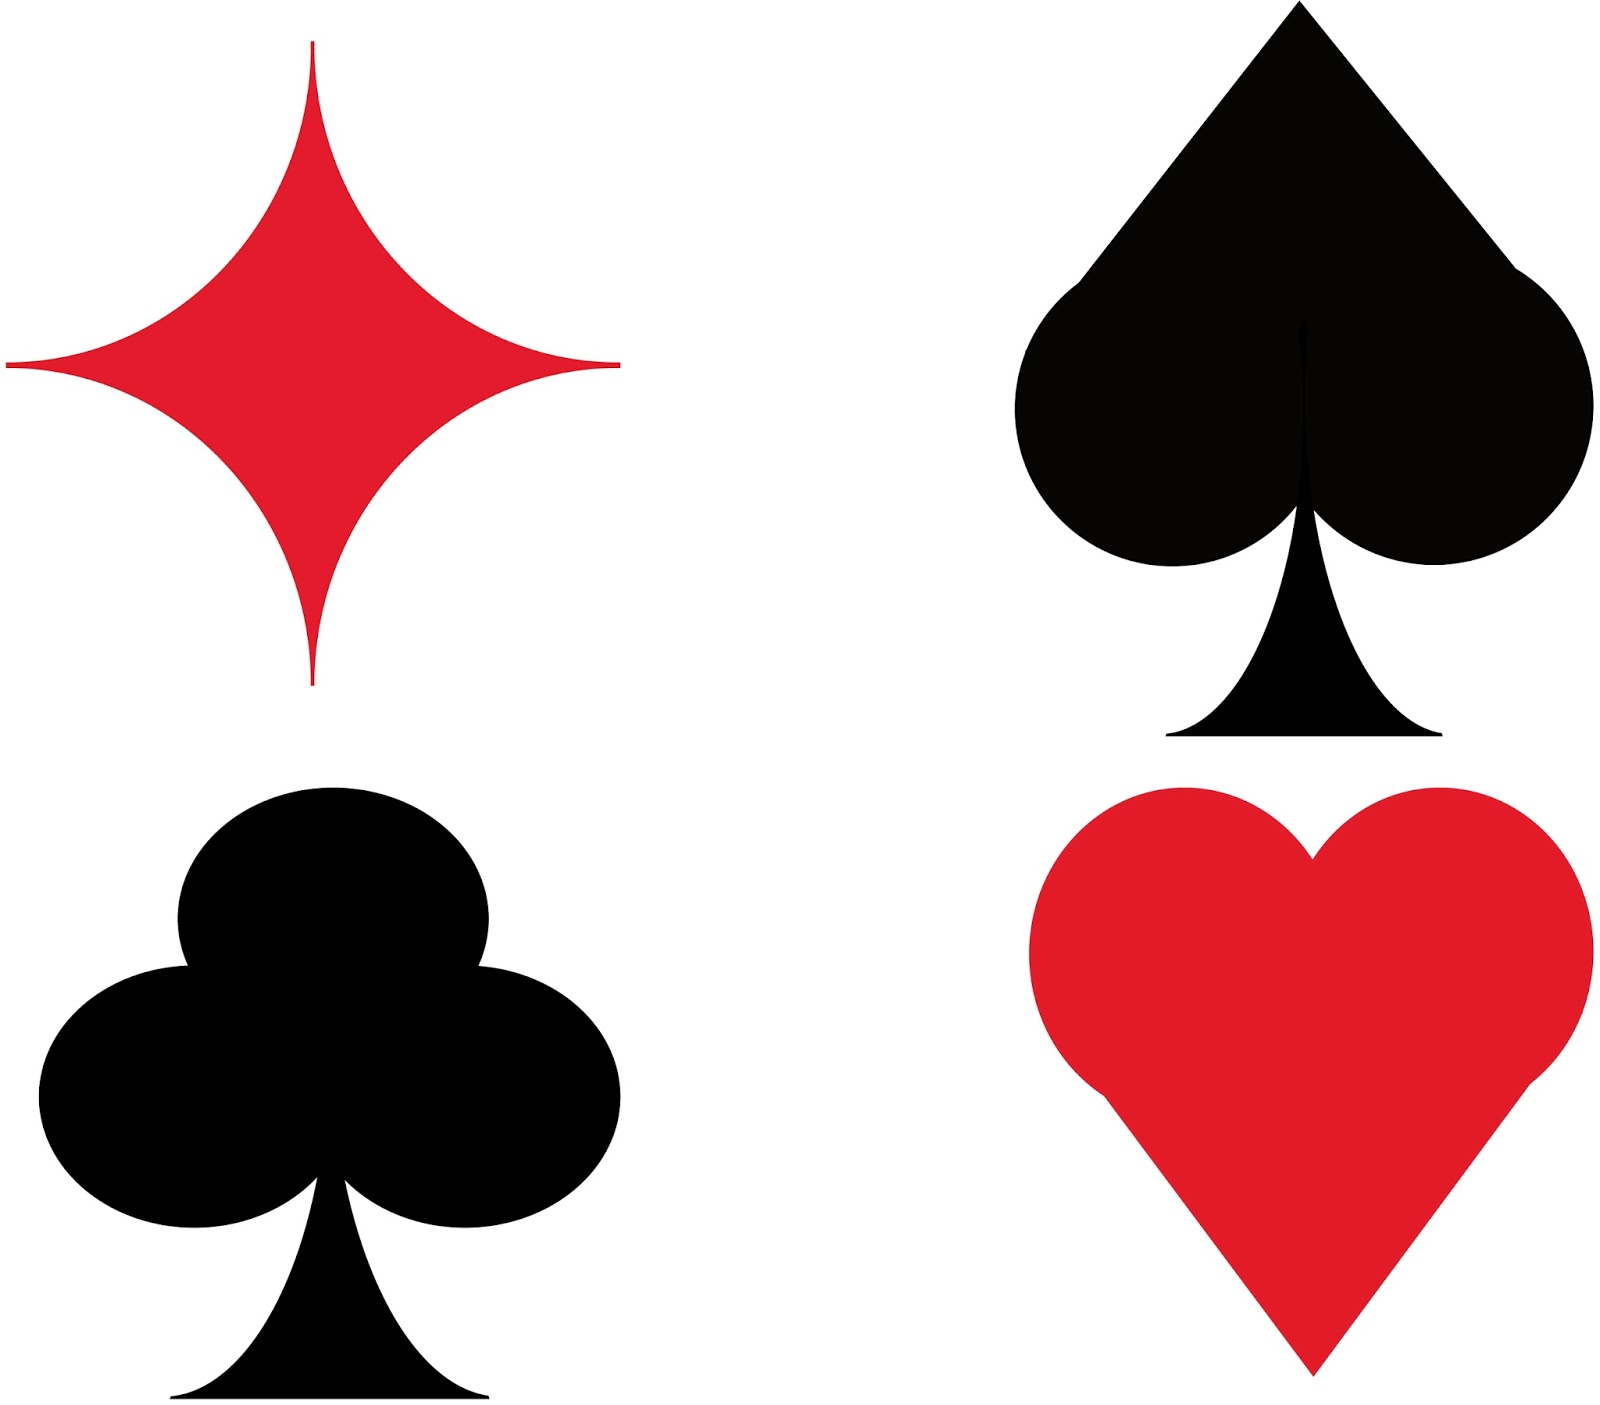 cartas de casino para colorear